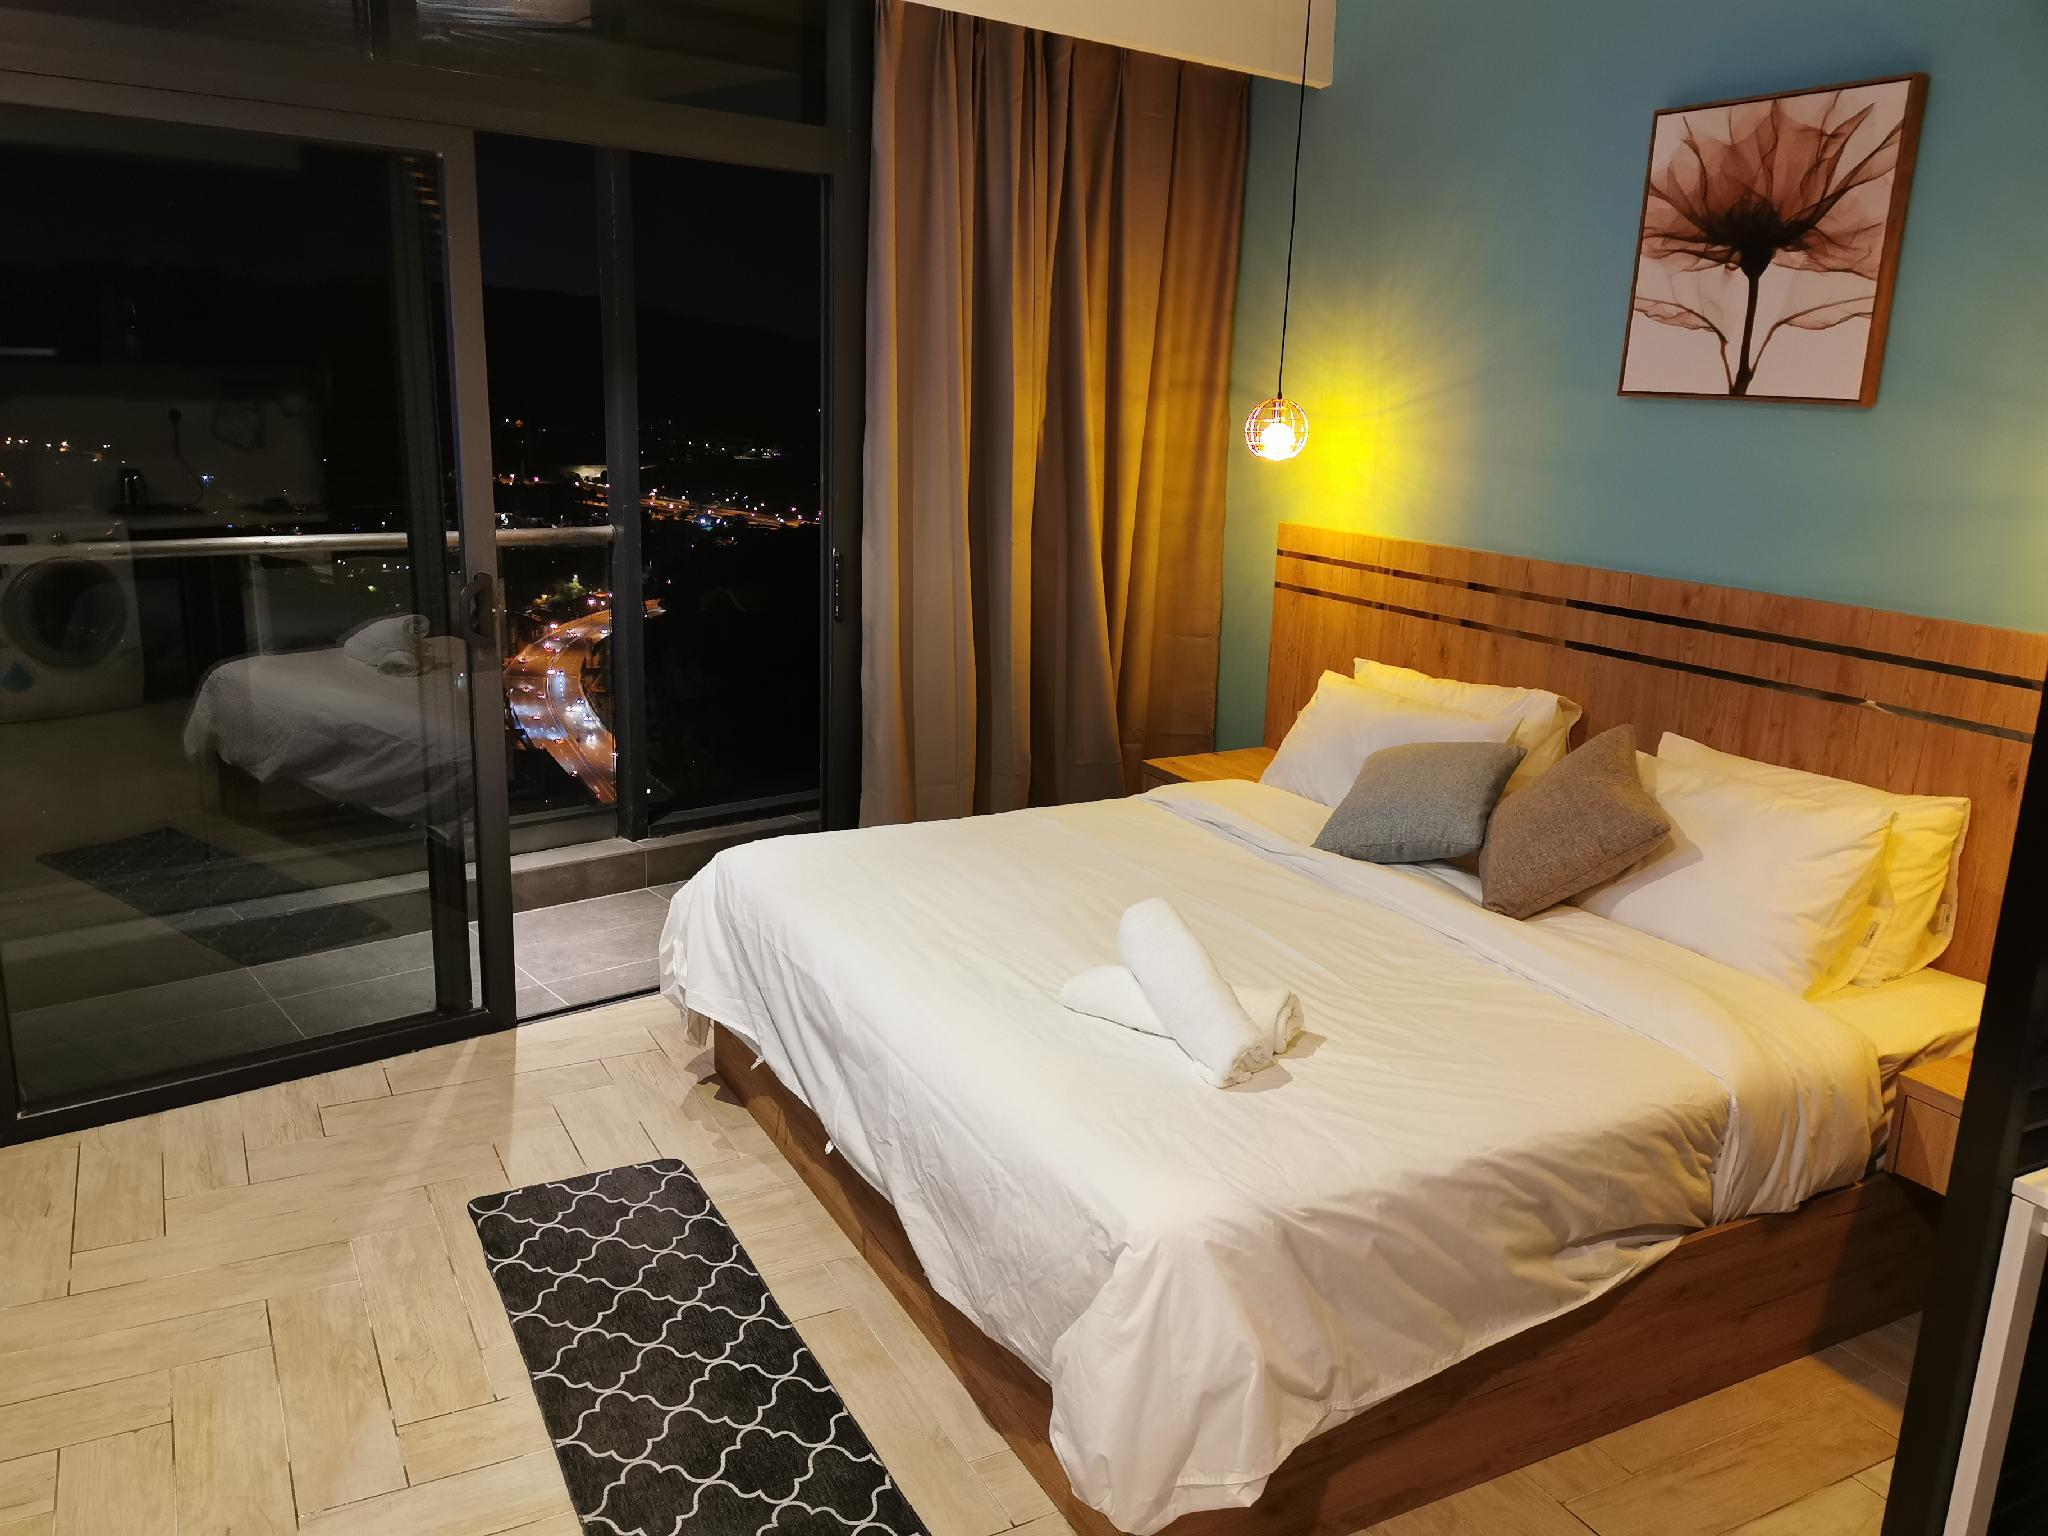 (New) Cozy Suite@Empire City(Self check in)